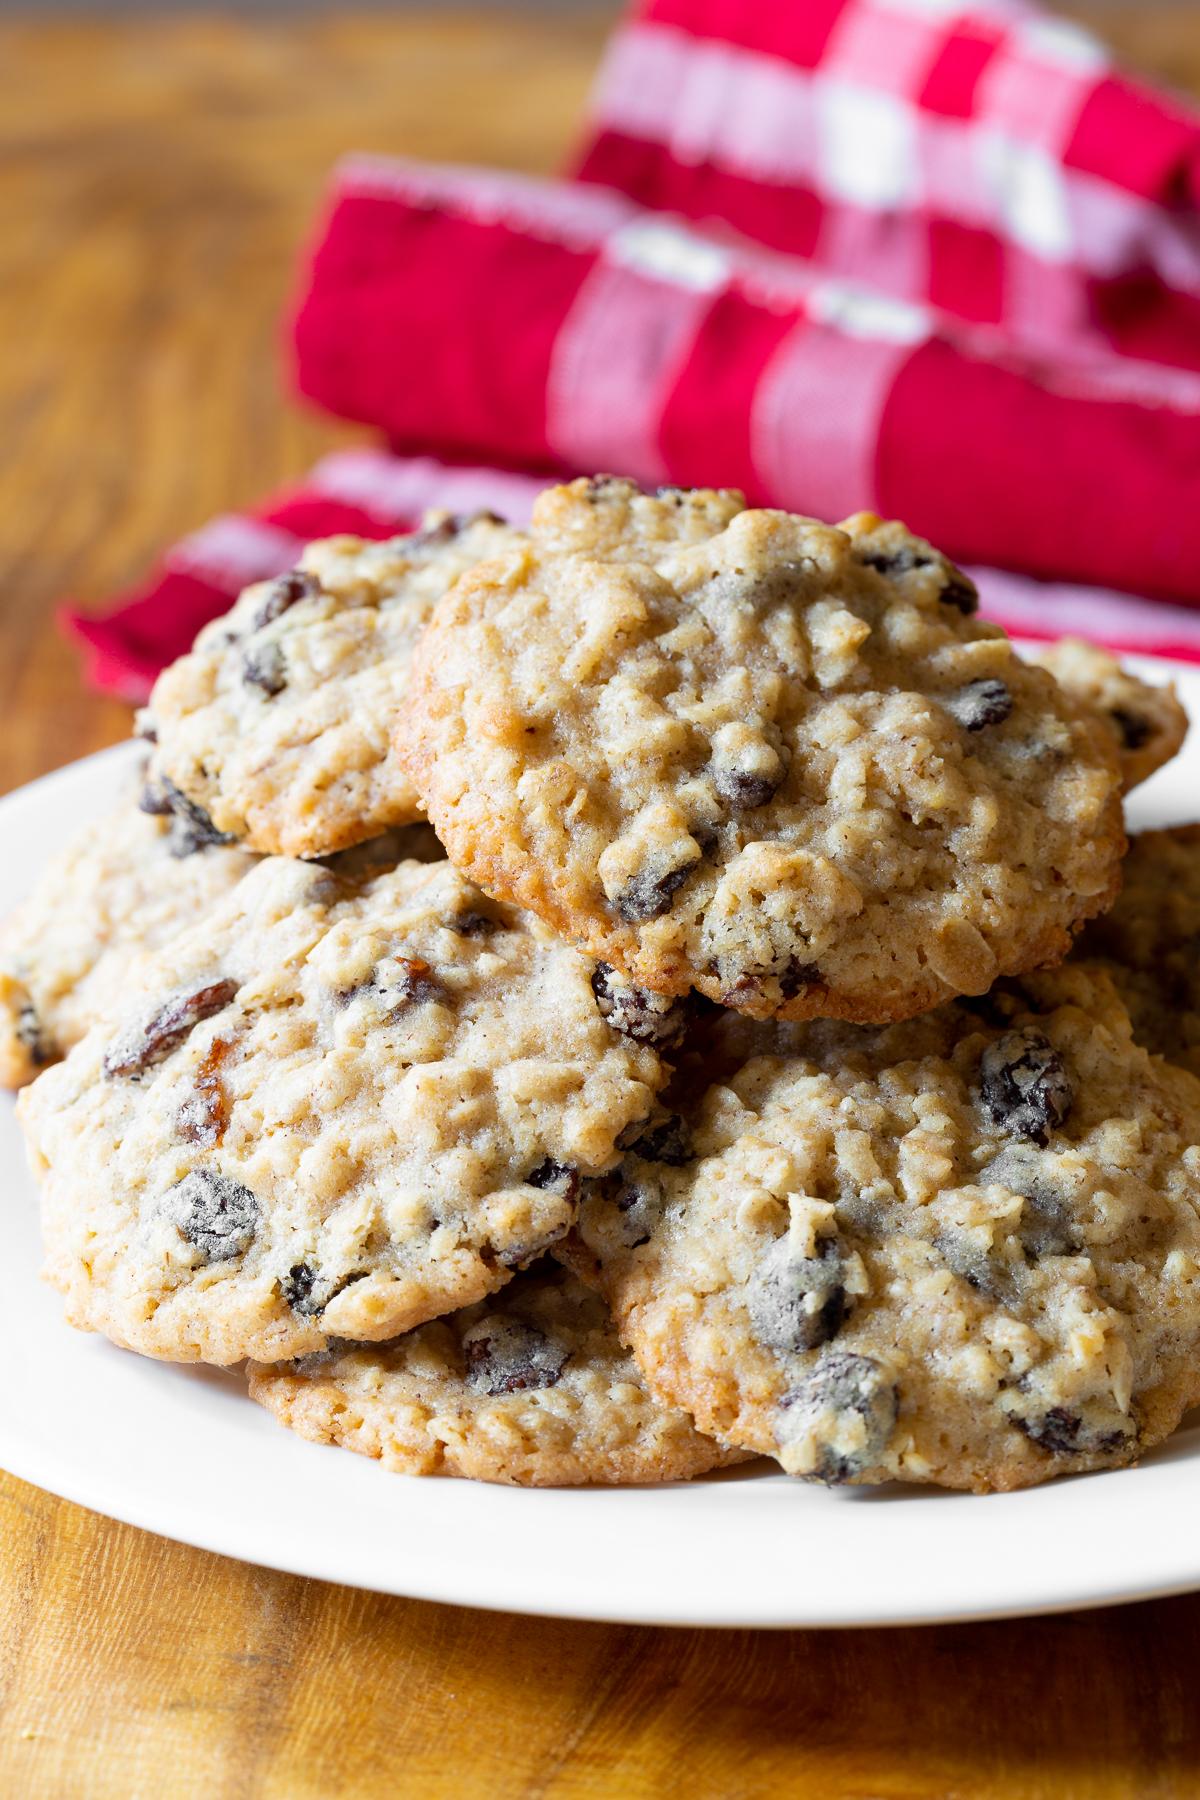 Homemade plate full of this oatmeal raisin cookie recipe